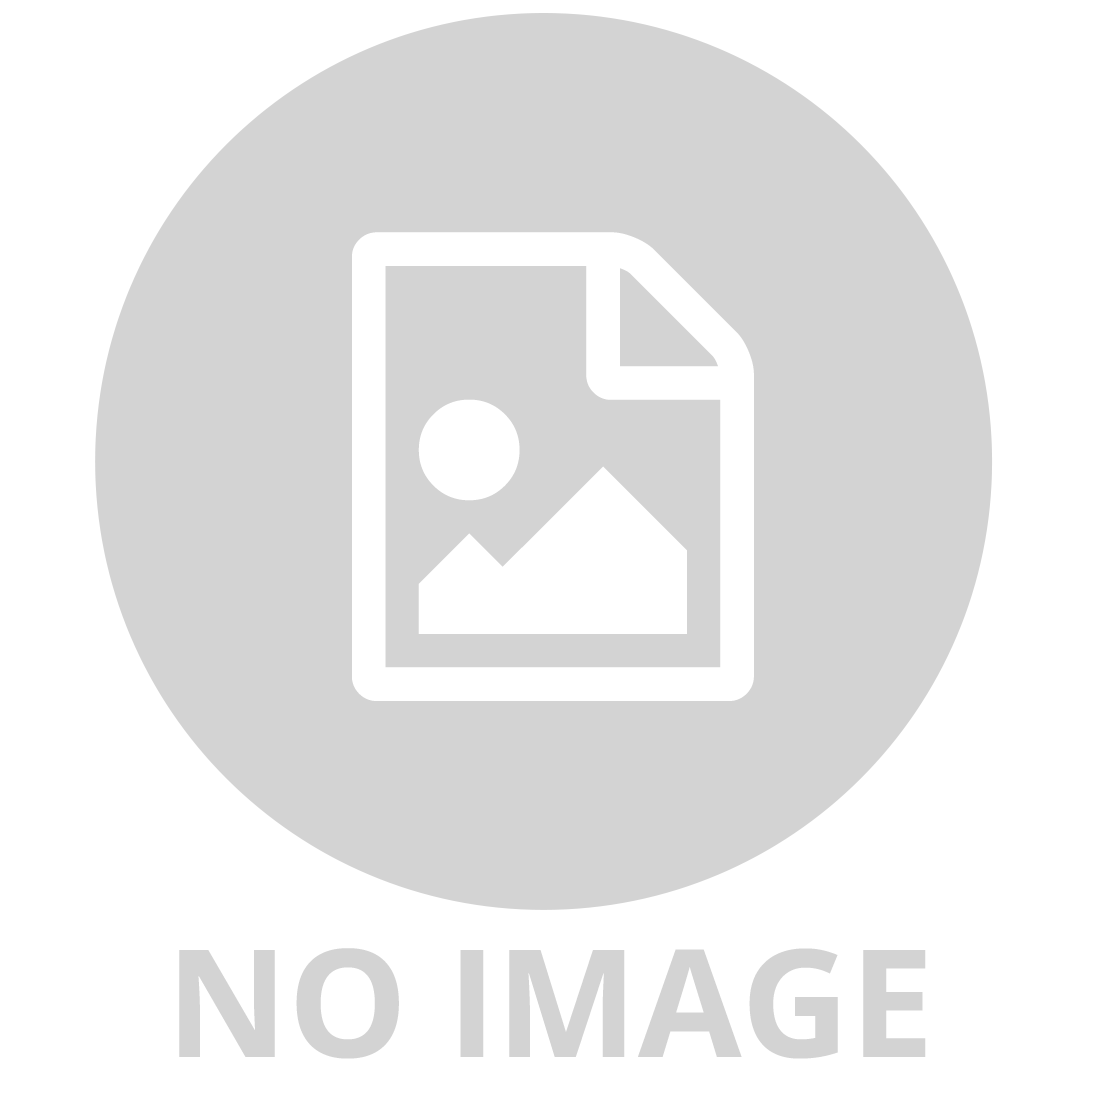 SURE LOX 1000PC JIGSAW PUZZLE WINTER WONDERLAND NEW ENGLAND WINTER